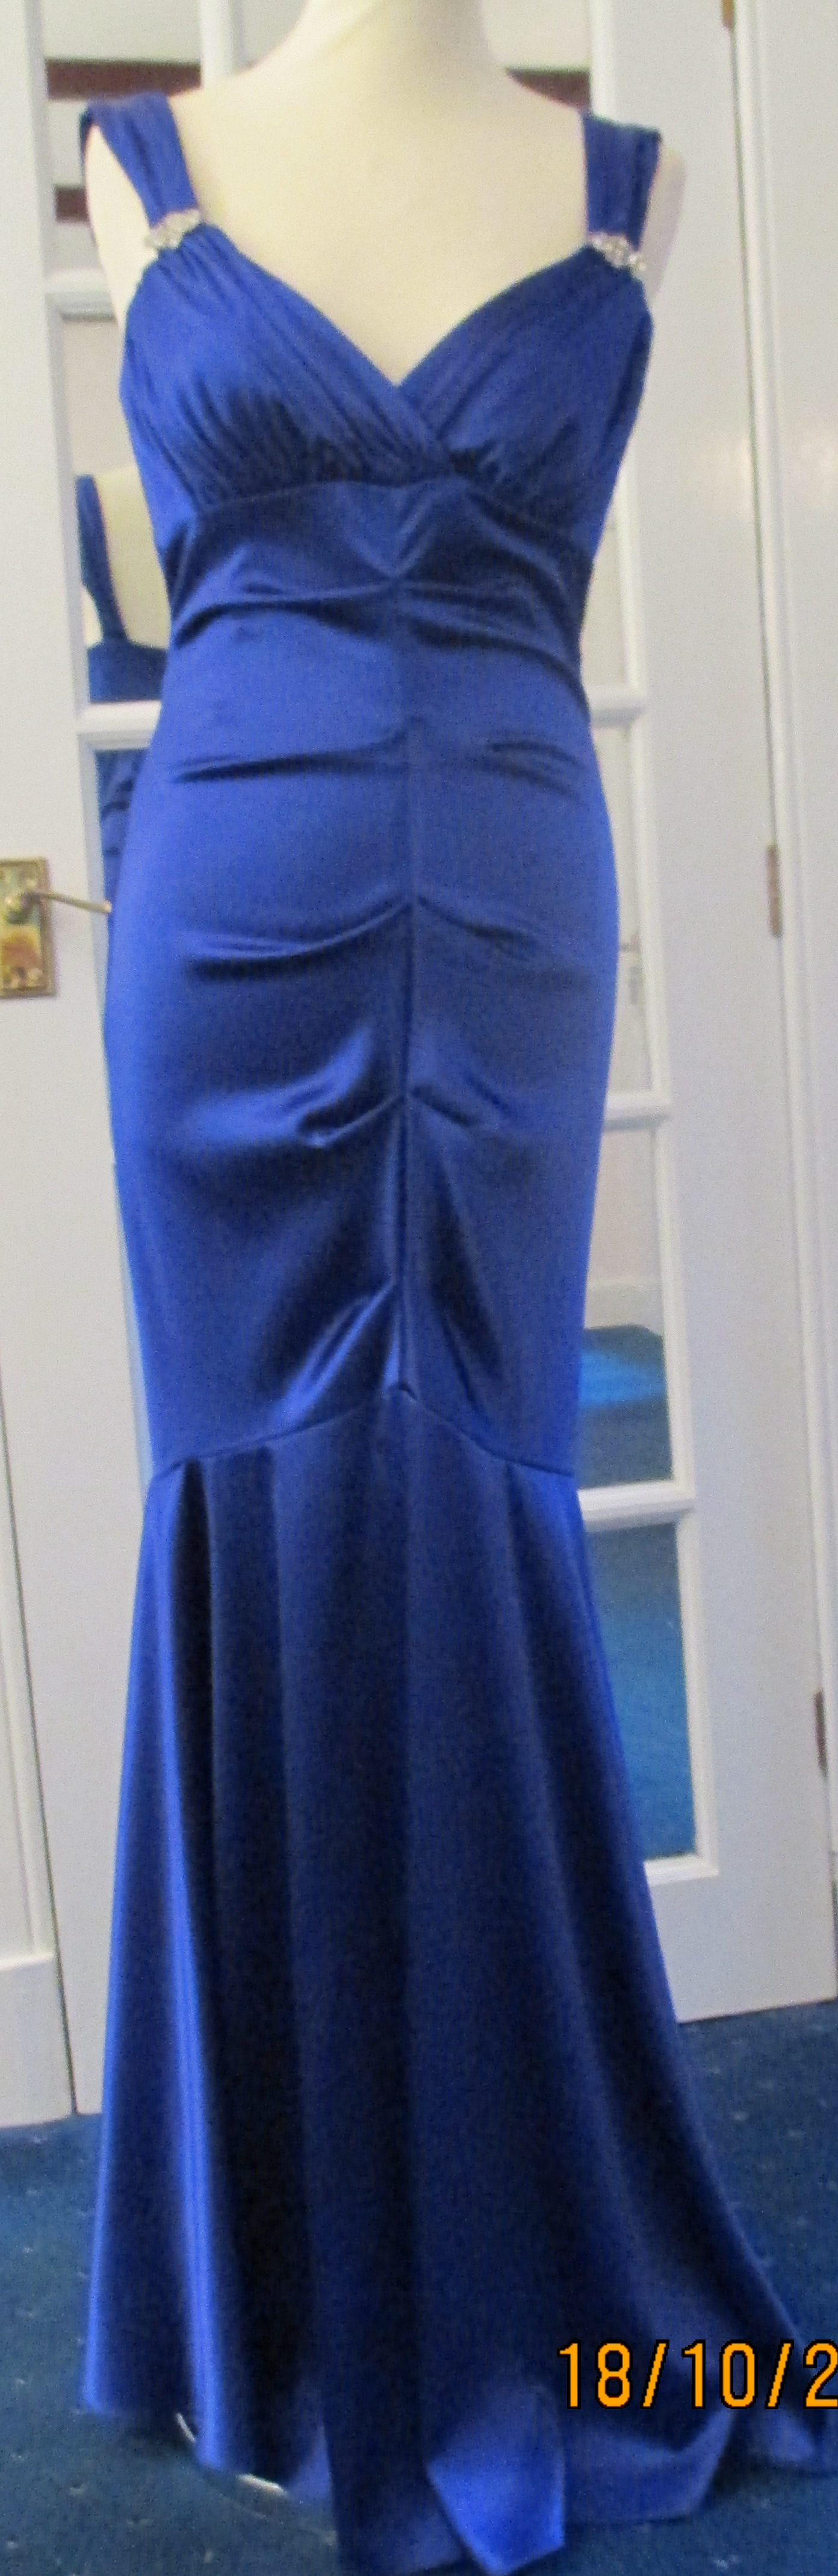 Laura S Dresses Dress Hire Glasgow